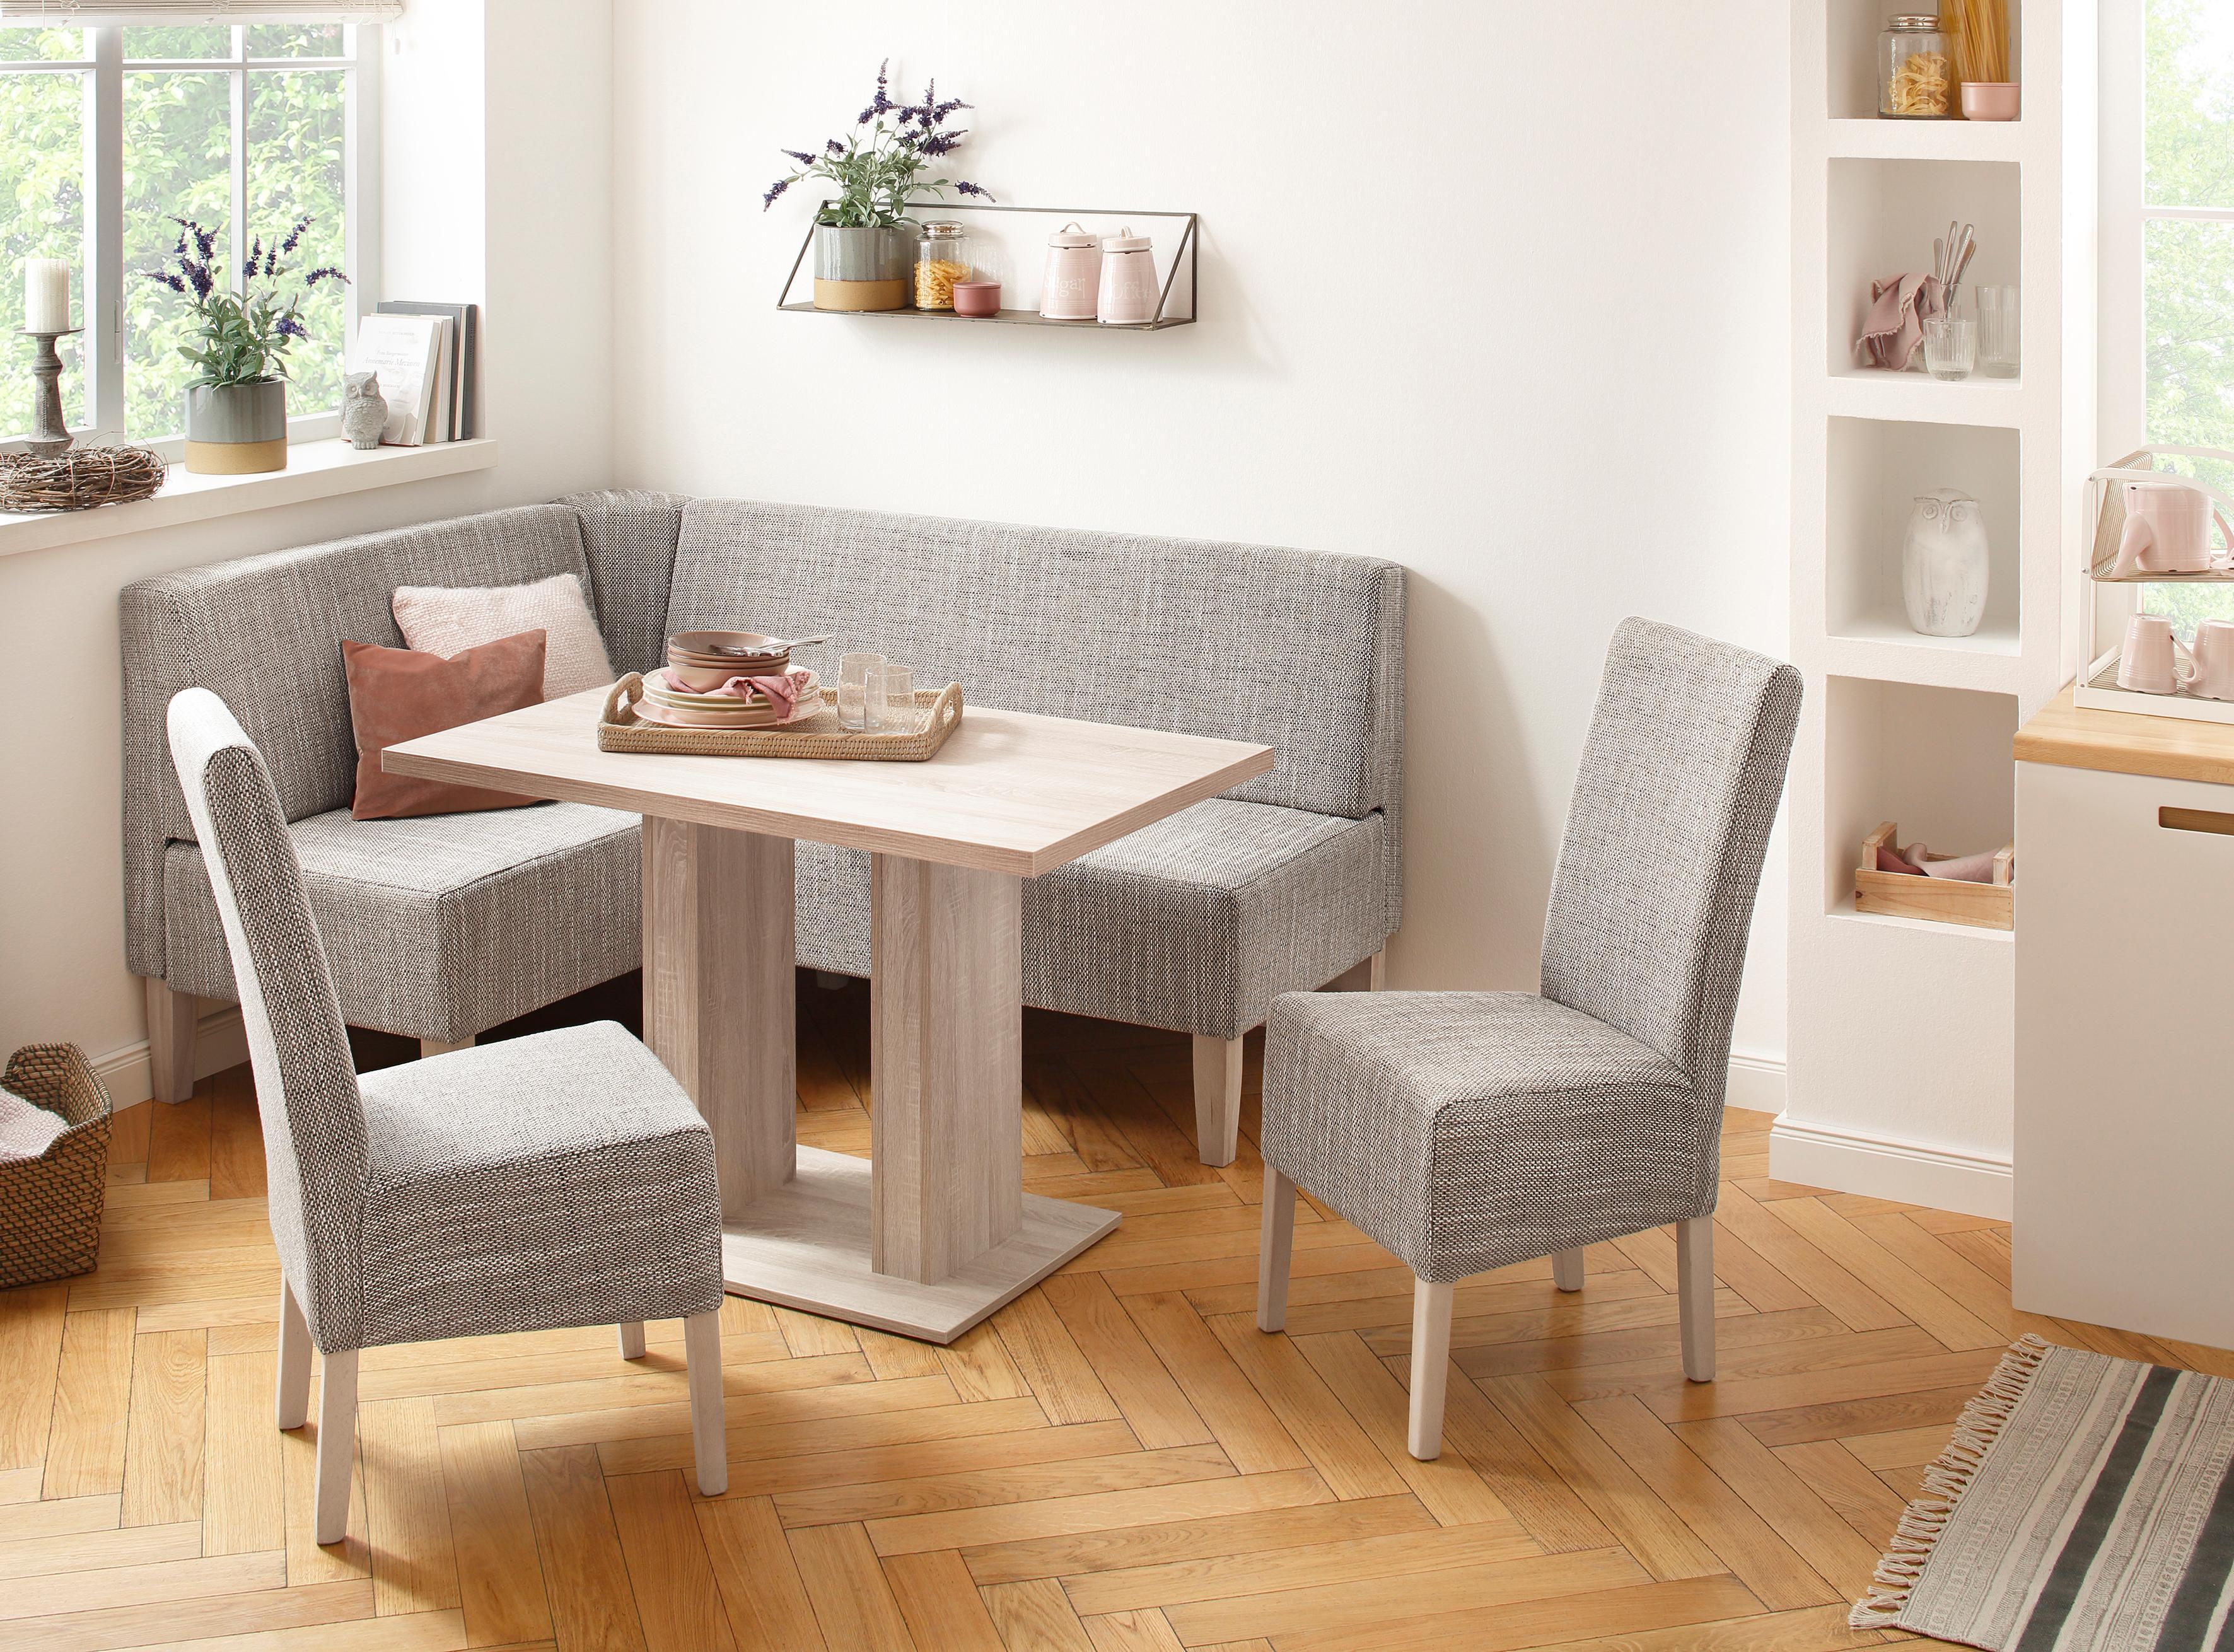 Home affaire Eckbankgruppe Hellen (Set, 4-tlg) | Küche und Esszimmer > Essgruppen > Eckbankgruppen | home affaire